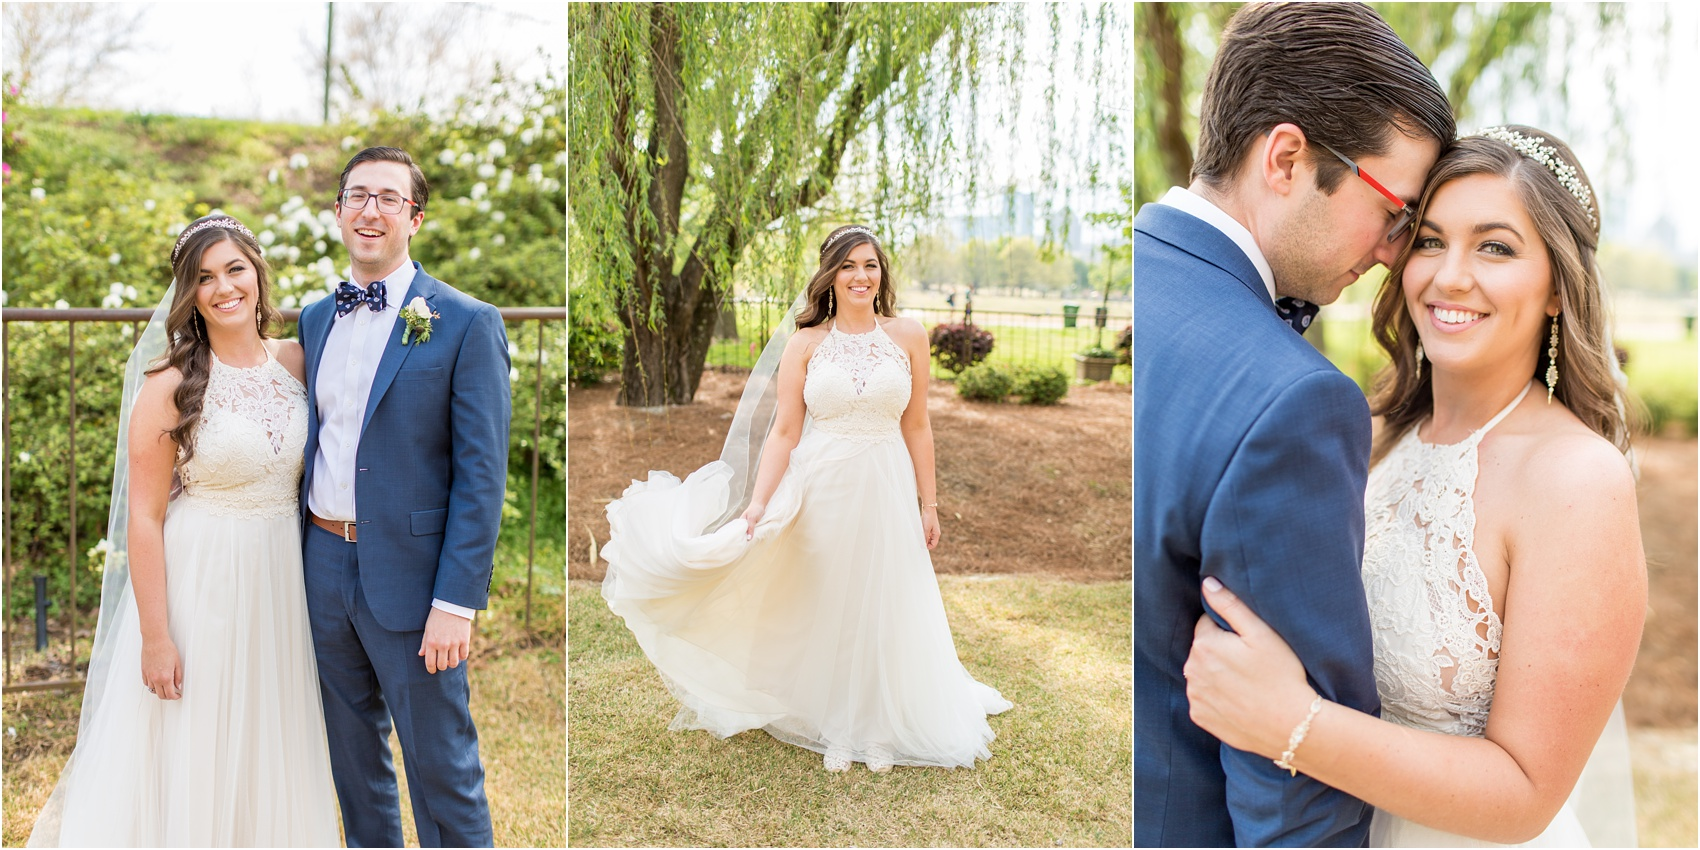 Savannah Eve Photography- Groseclose Wedding- Blog-20.jpg